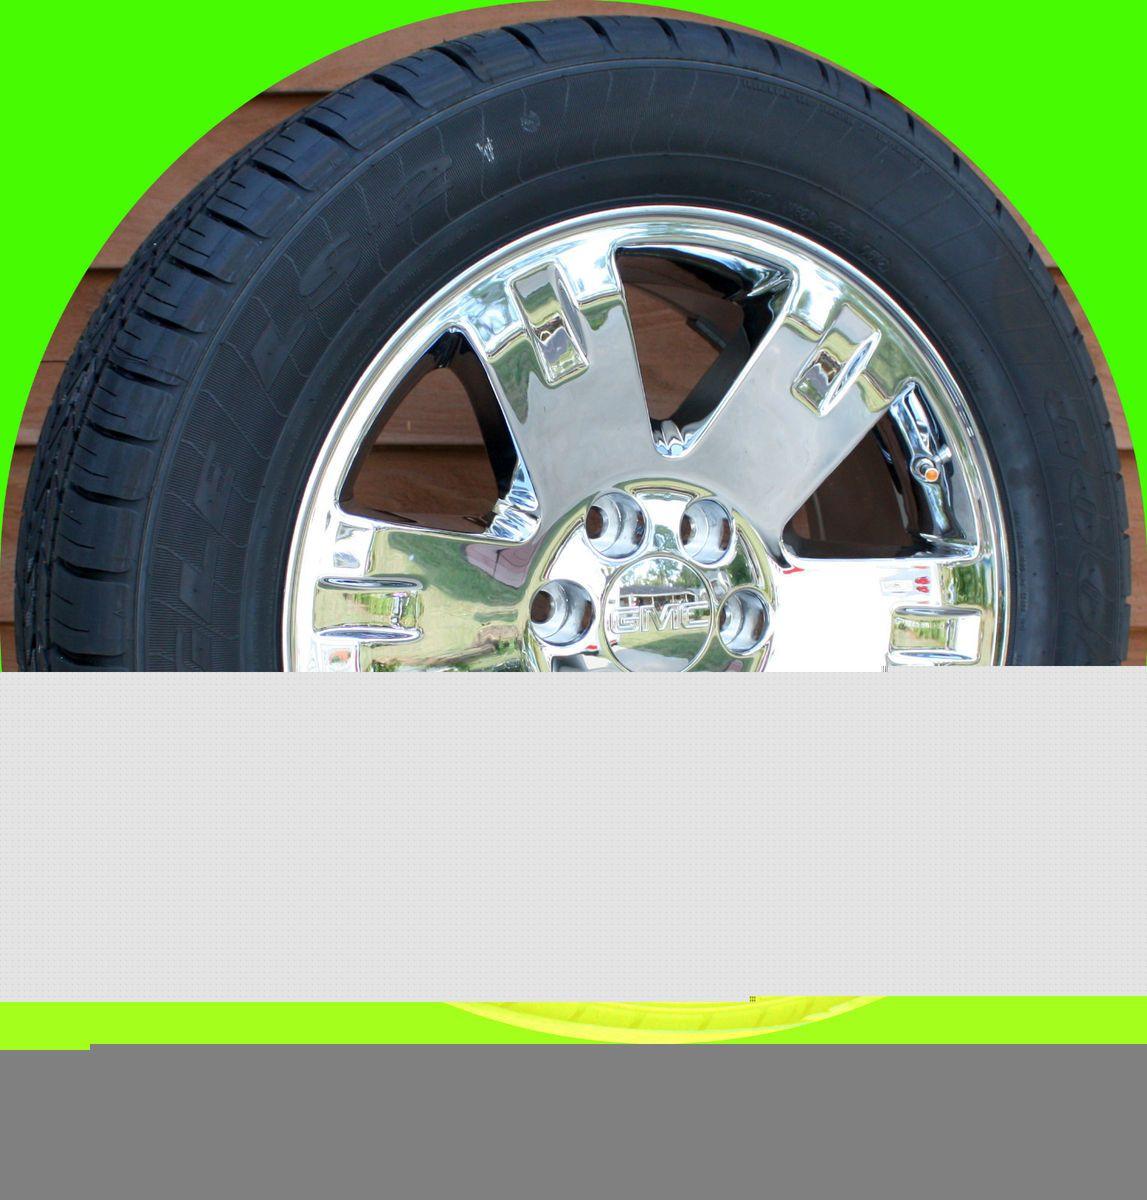 New GMC Sierra Yukon Denali 20 in Wheels Goodyear 275 55R20 Tires Set